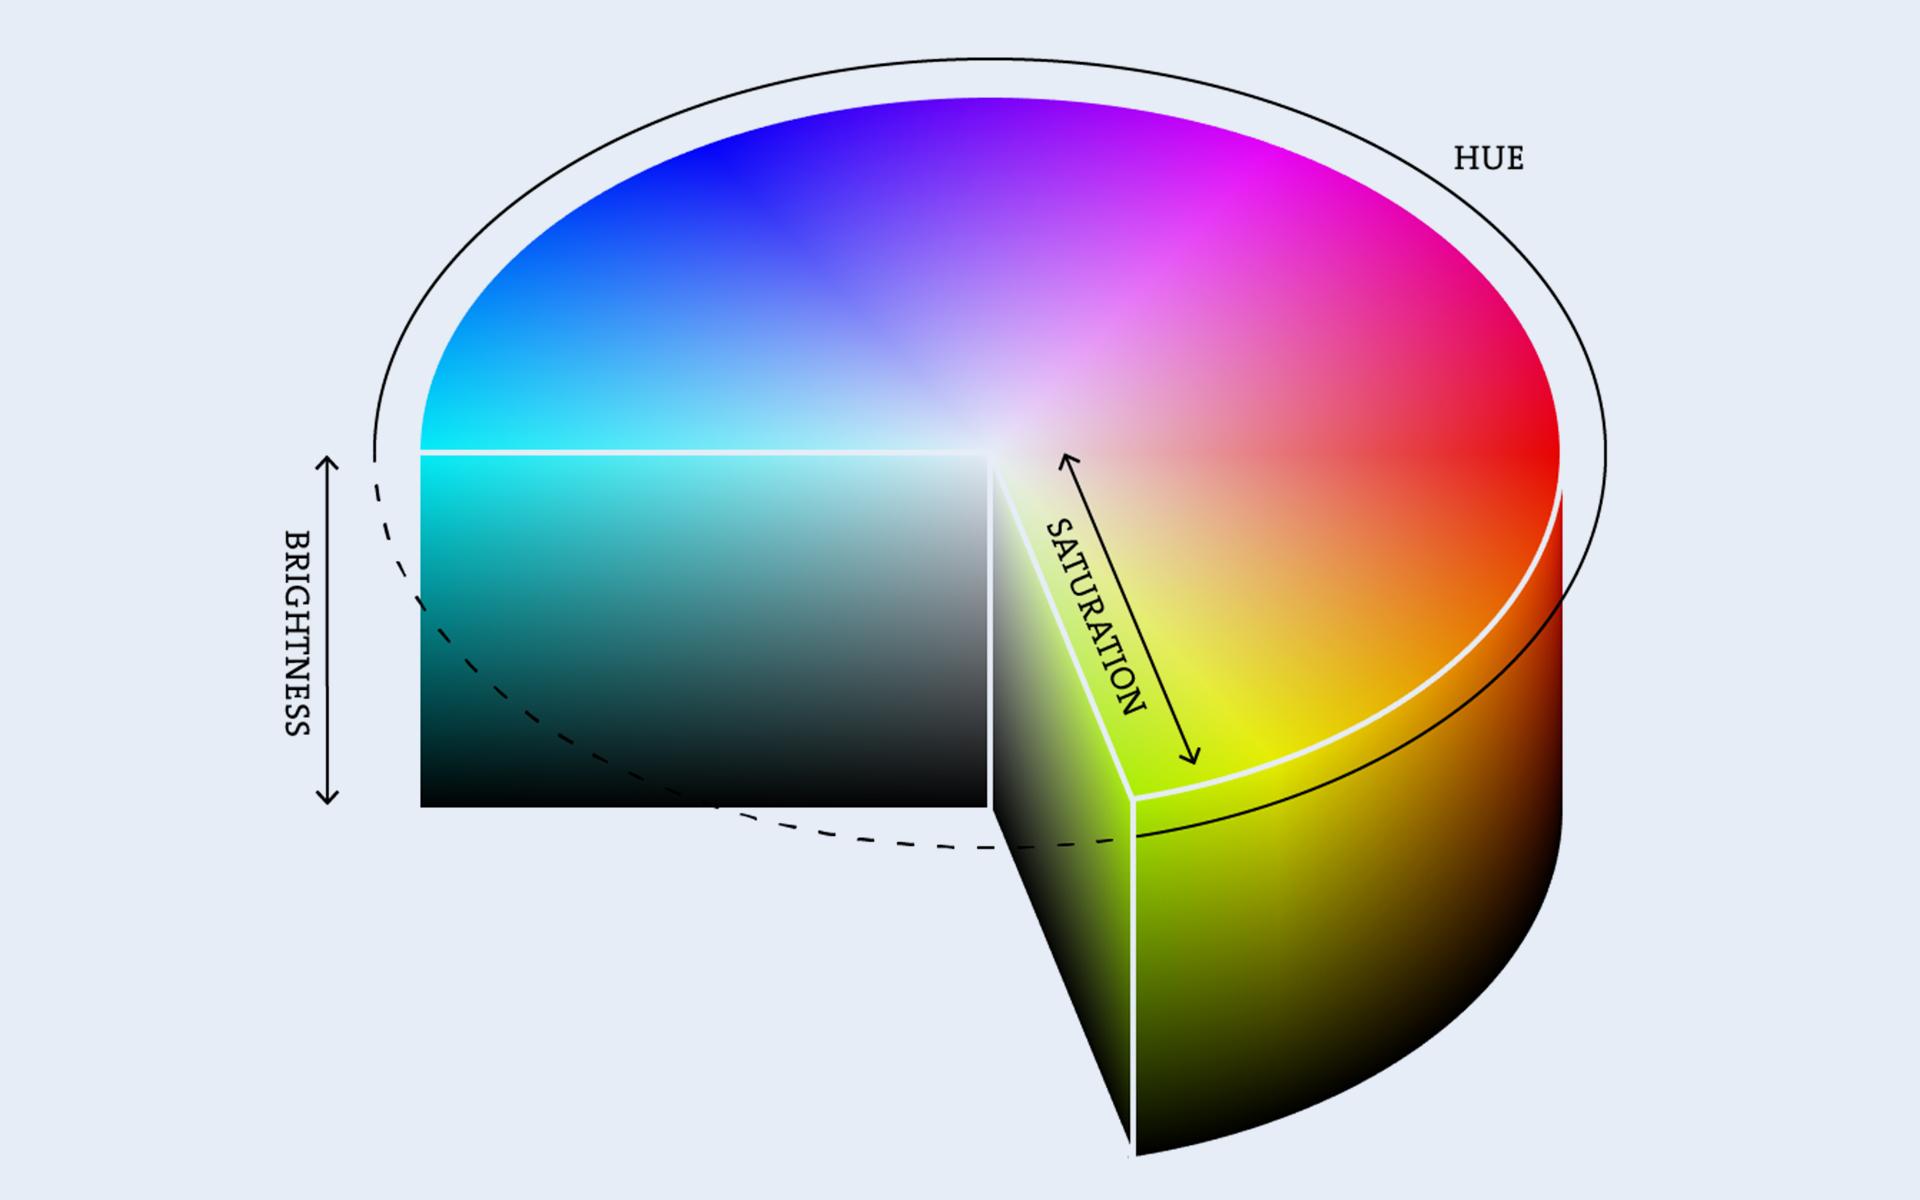 Hue-Saturation-Brightness